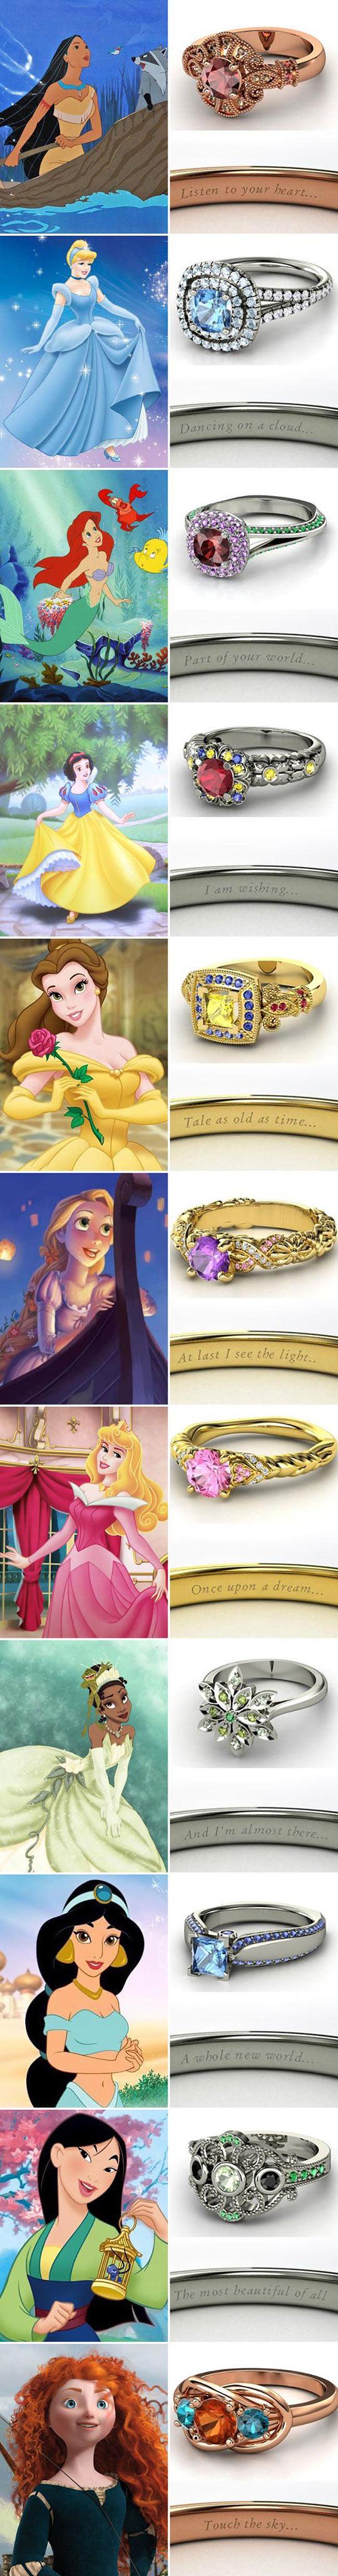 If Disney Princesses Were Rings